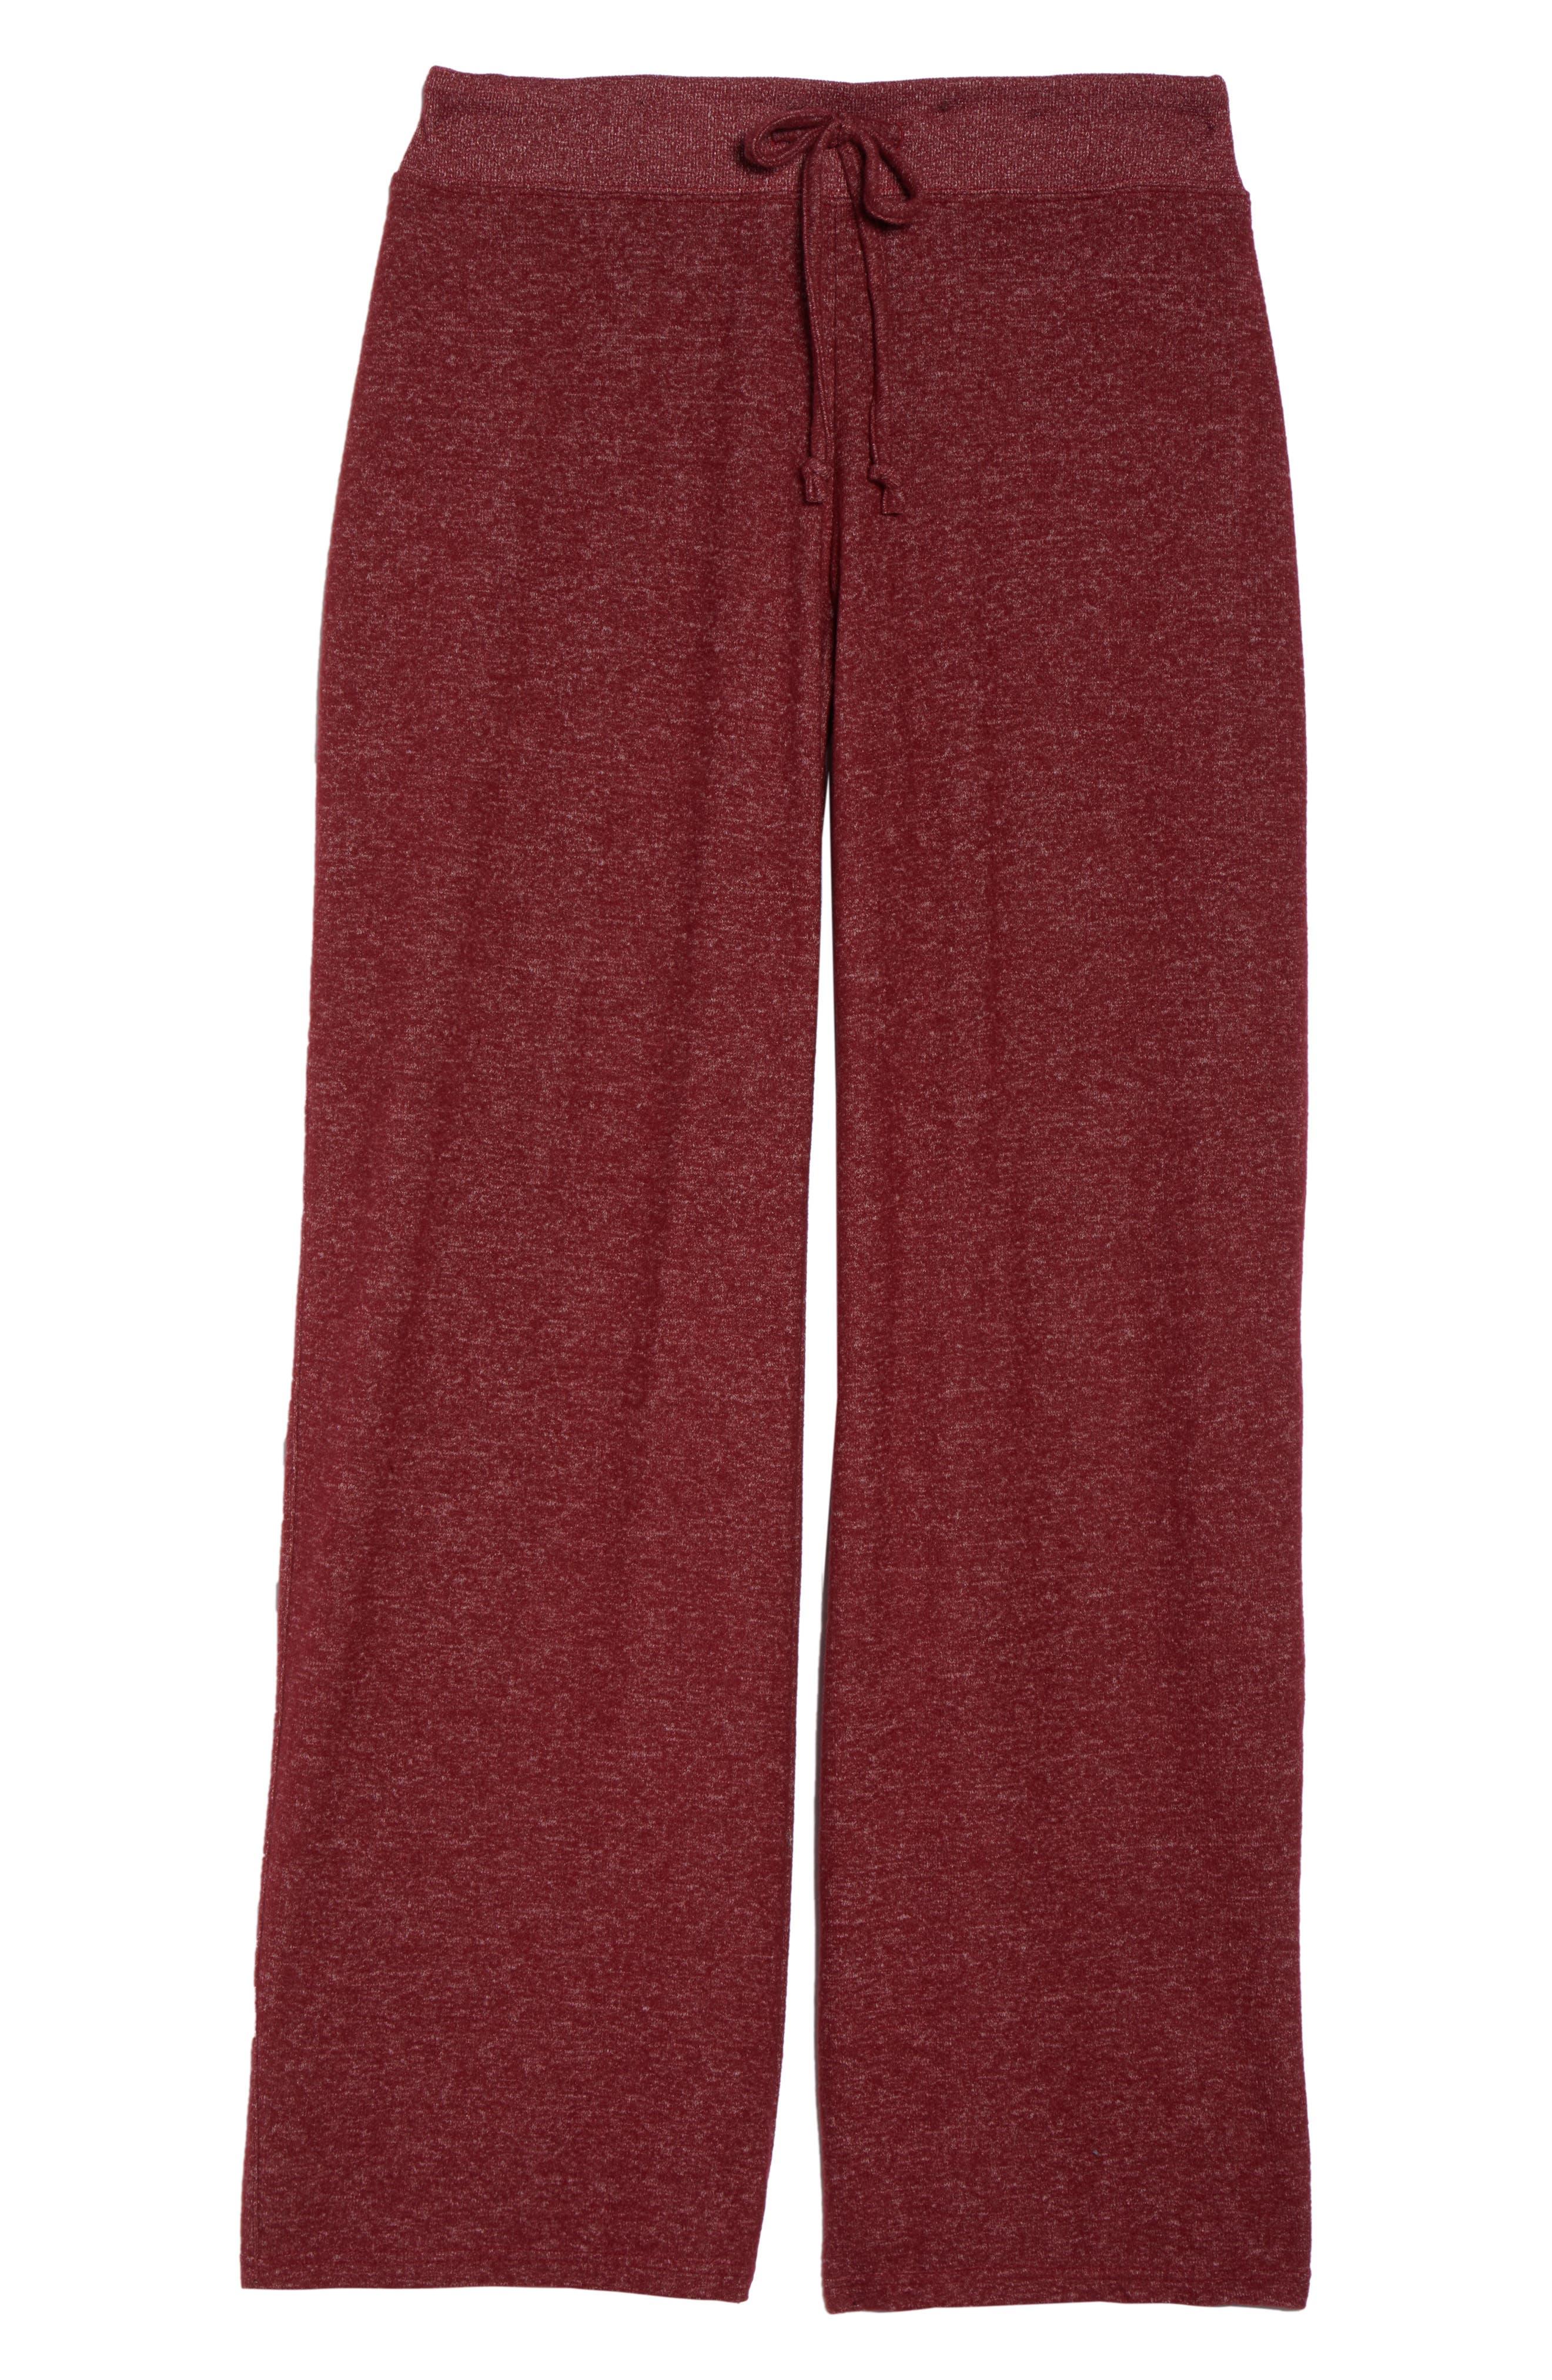 'Best Boyfriend' Brushed Hacci Lounge Pants,                             Alternate thumbnail 7, color,                             Red Grape